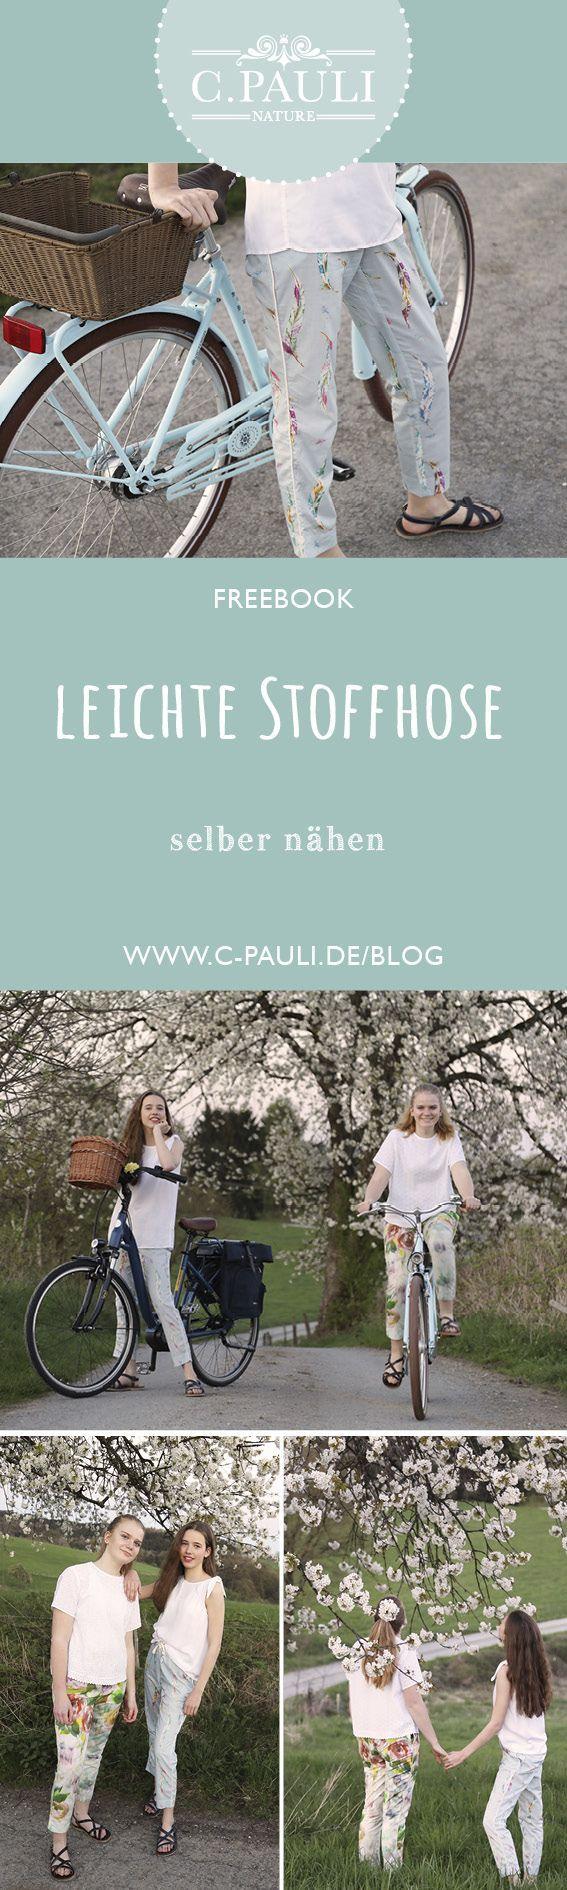 Leichte Stoffhose   C.Pauli Nature Blog